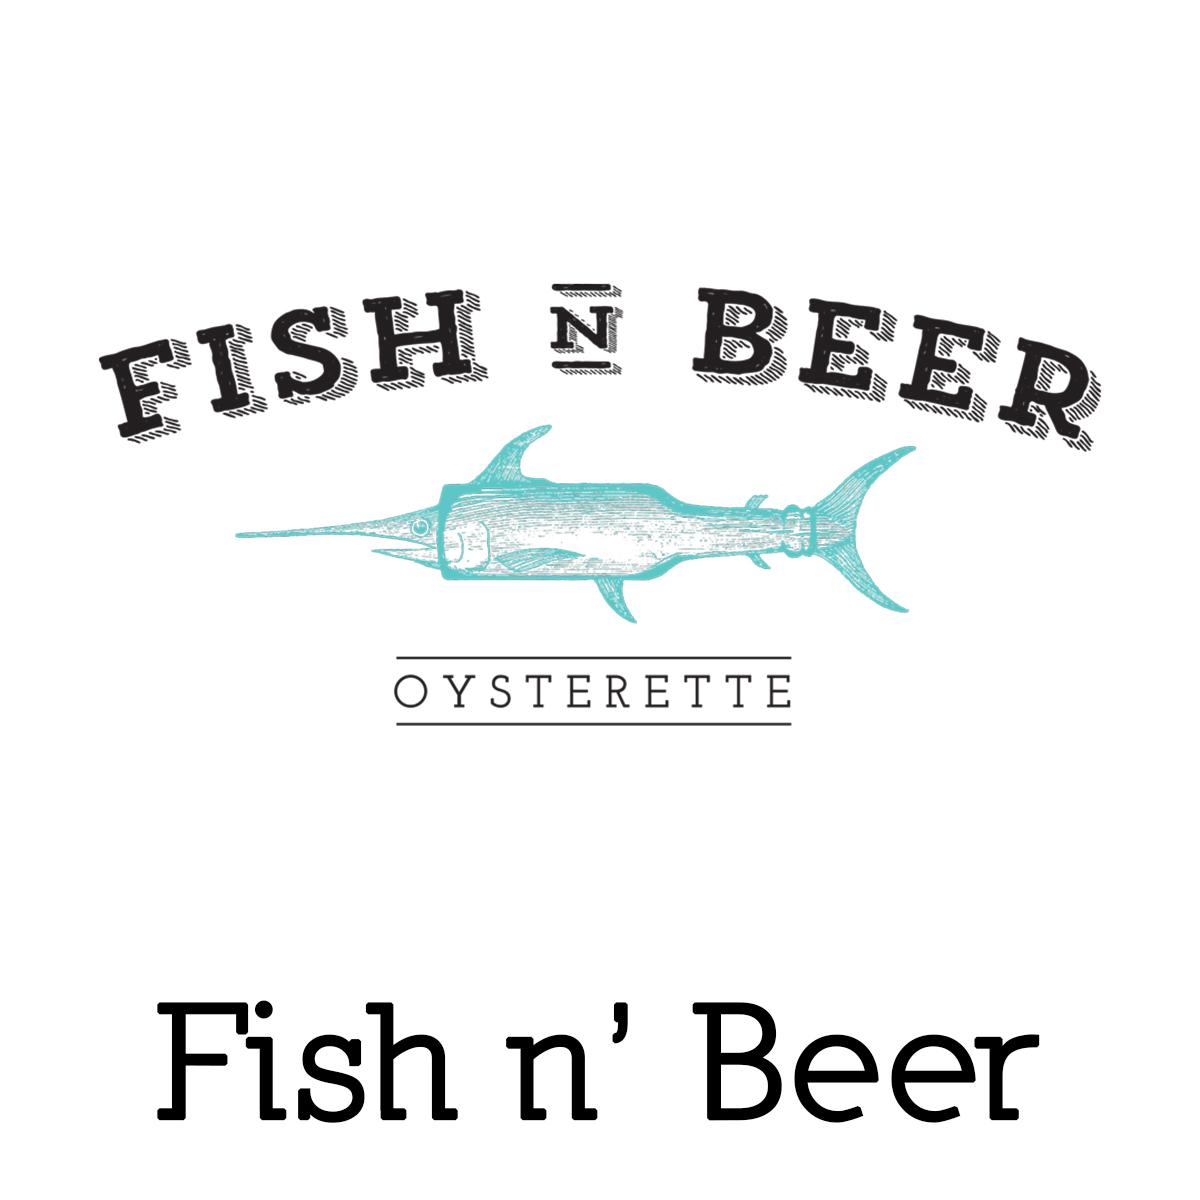 fish-n-beer_resized-for-web.jpg